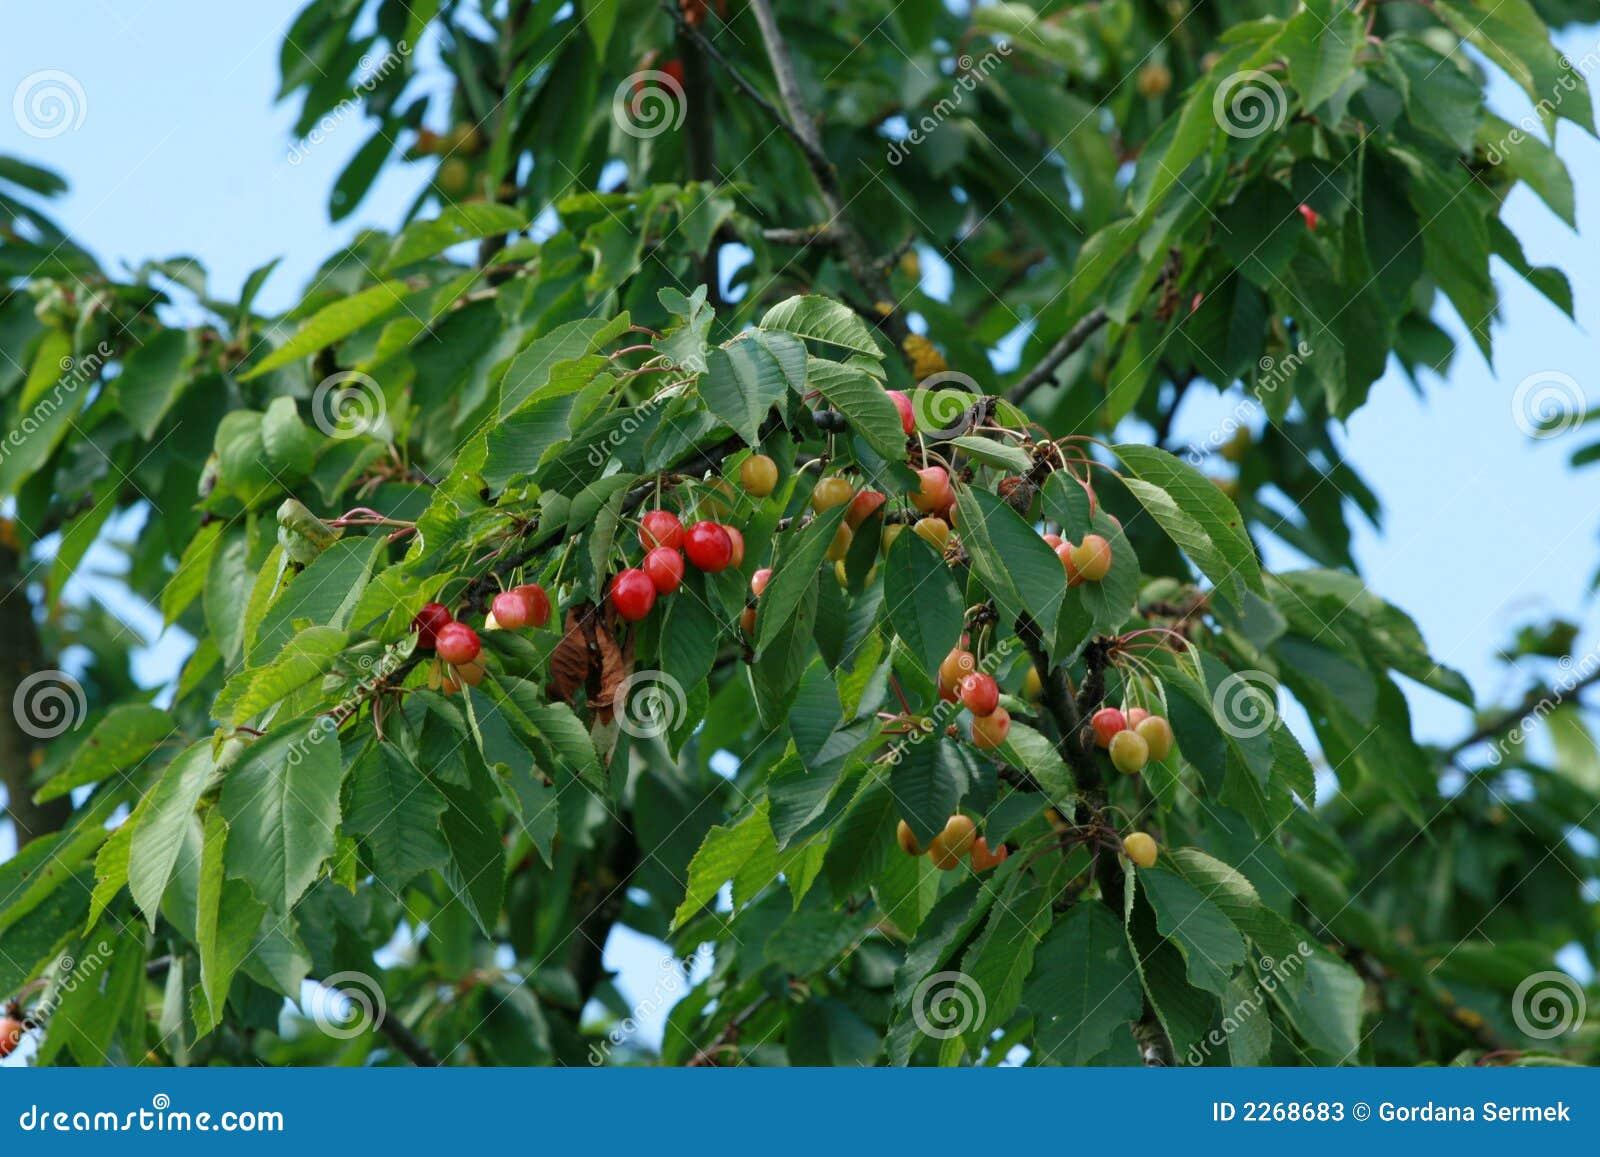 arbre fruitier de cerise image stock image du frais gentil 2268683. Black Bedroom Furniture Sets. Home Design Ideas